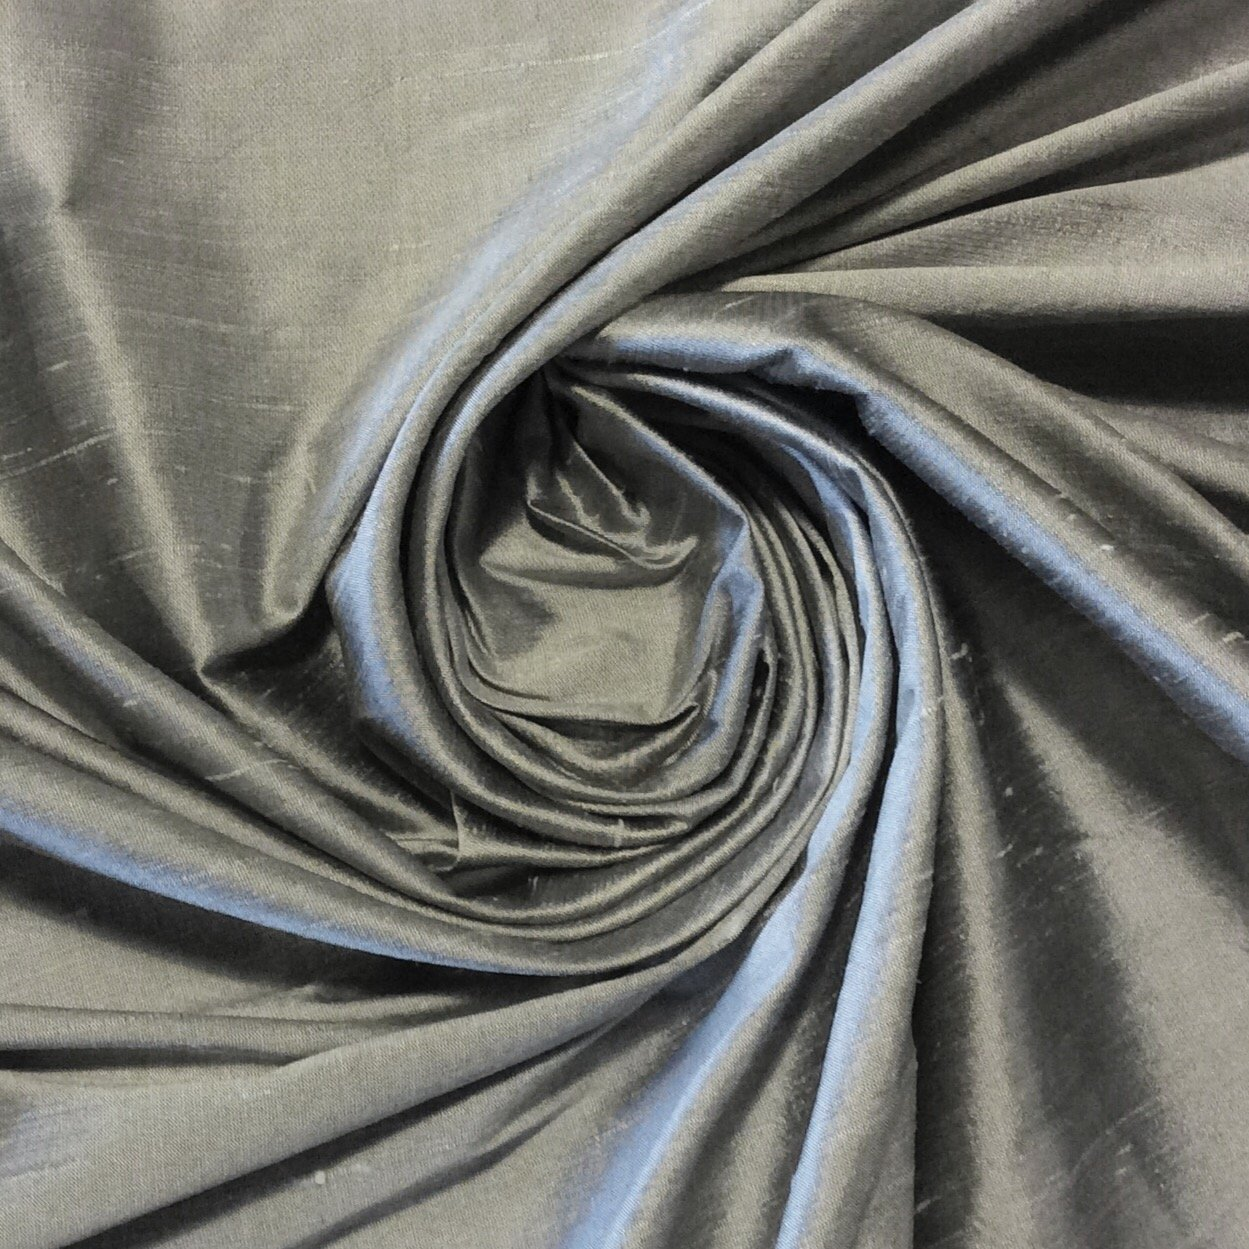 Exquisite Dupioni 100% Silk Fabric Drapery Fabric BTY Silver Iridescent SMW22